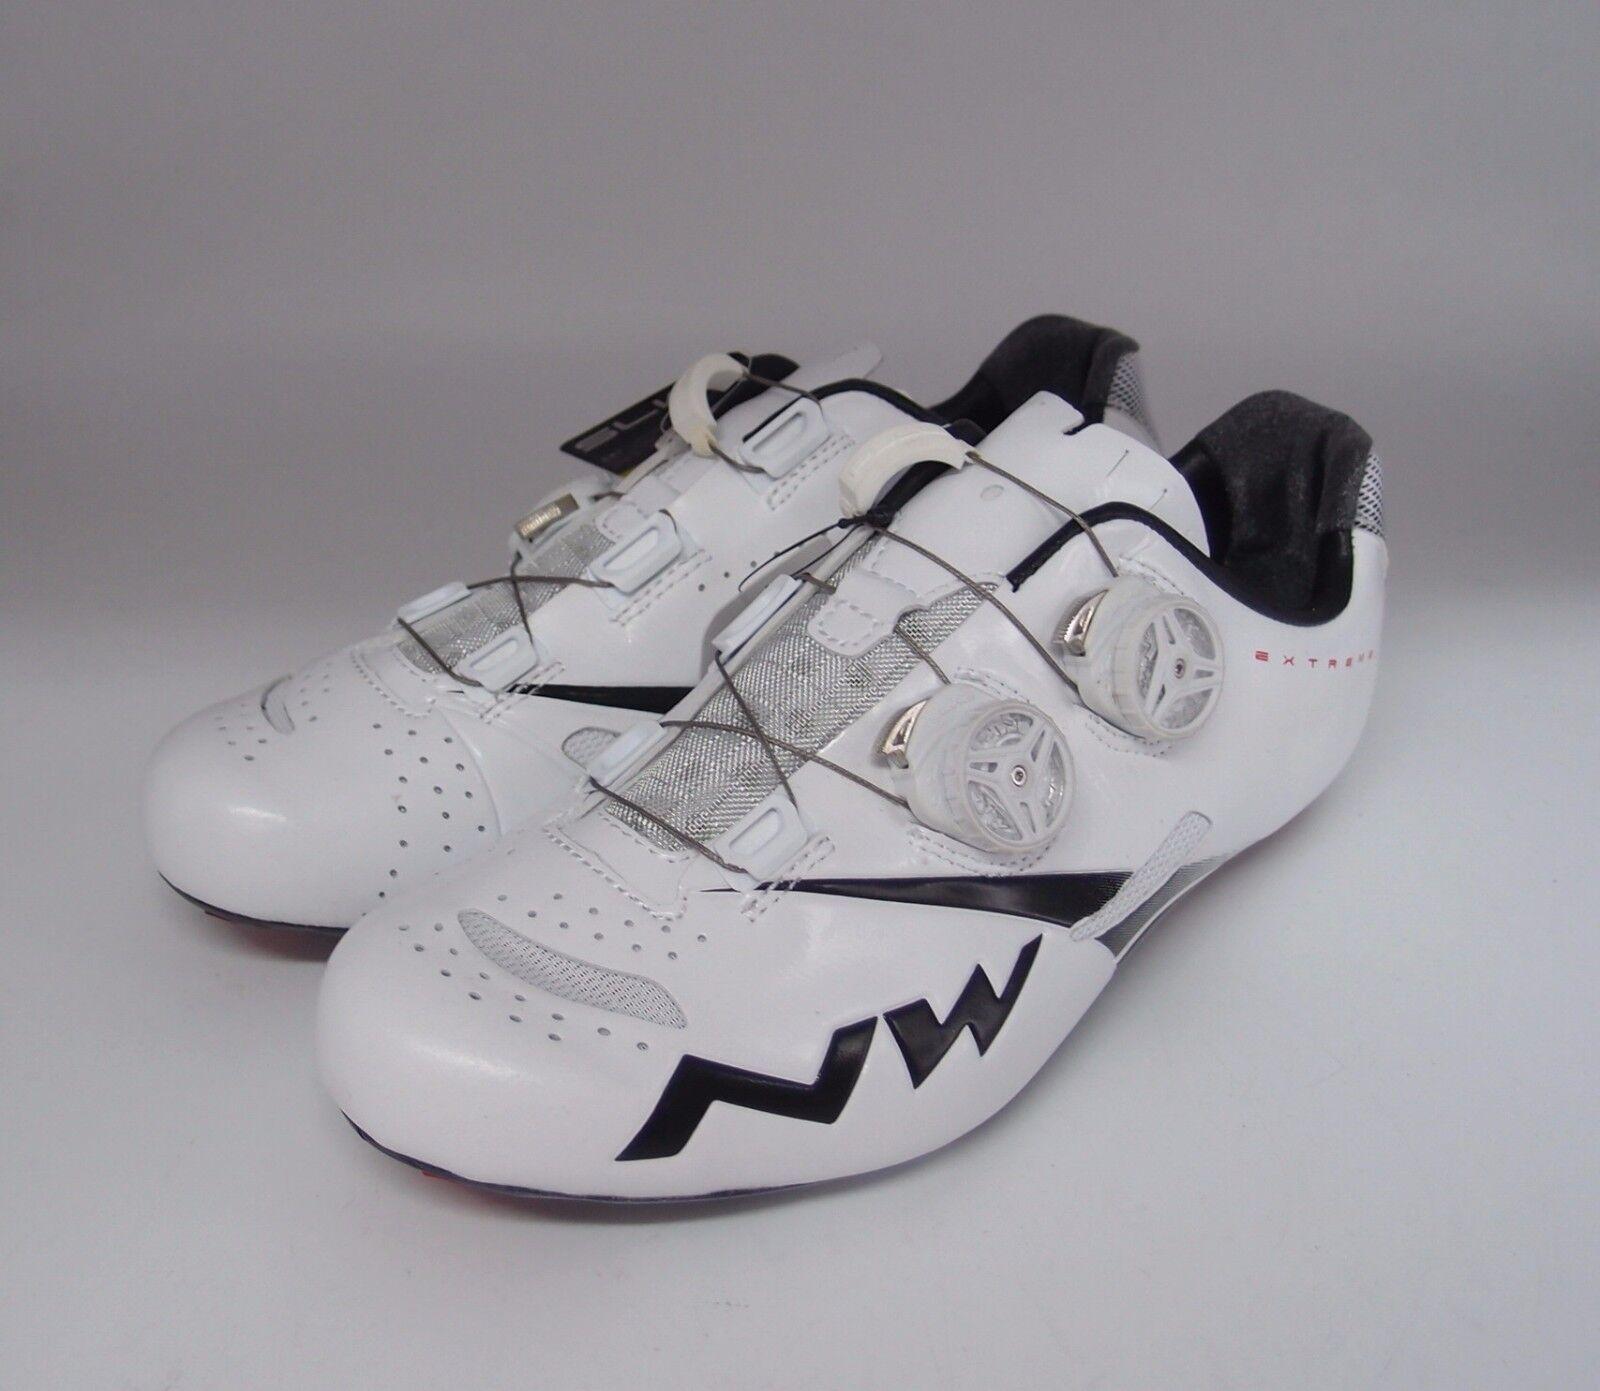 Northwave Extreme Tech + zapatos talla 42.5 blancoo Negro